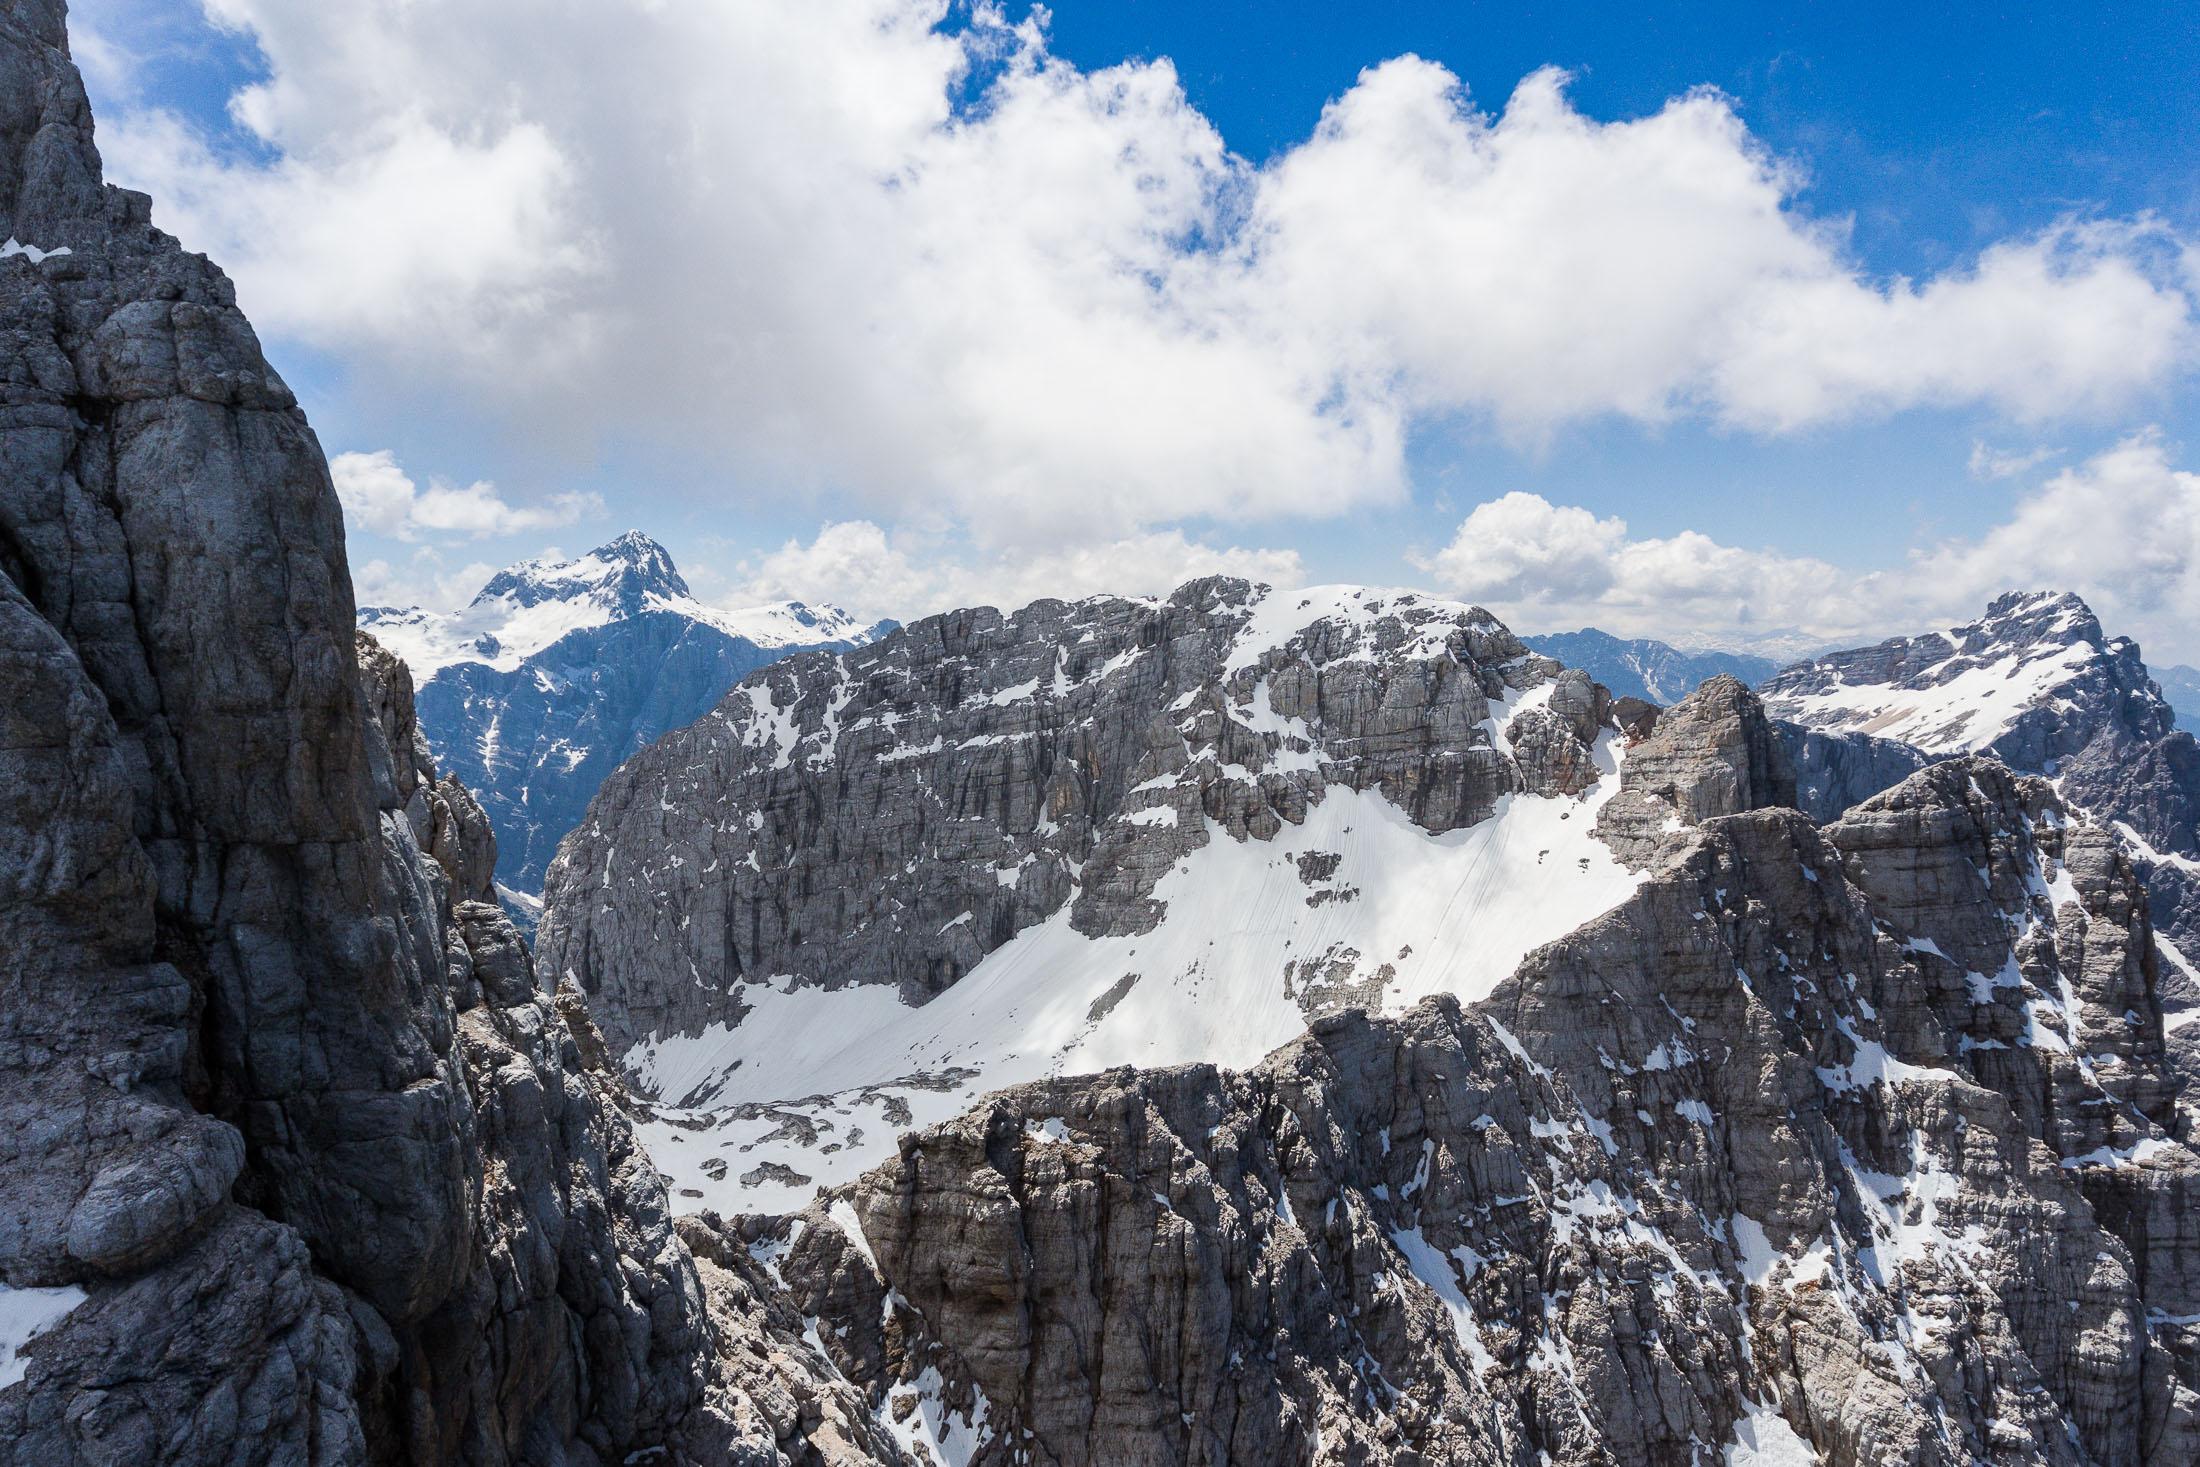 Julian Alps, Dolkova spica with Mt. Triglav in the back, Slovenia